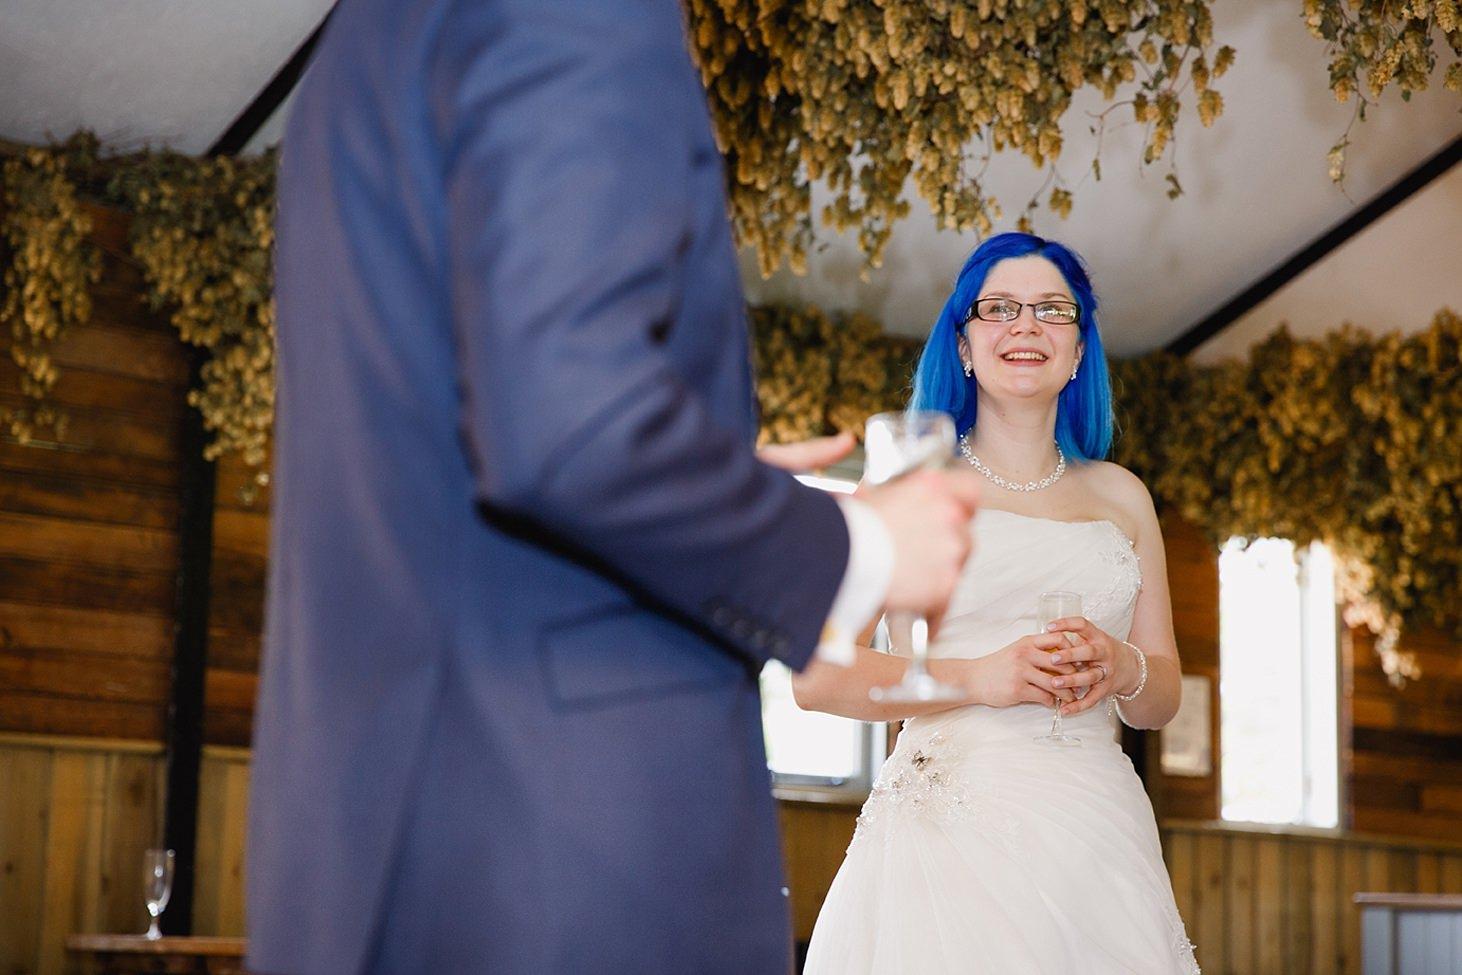 gate street barn wedding photography bride during speeches